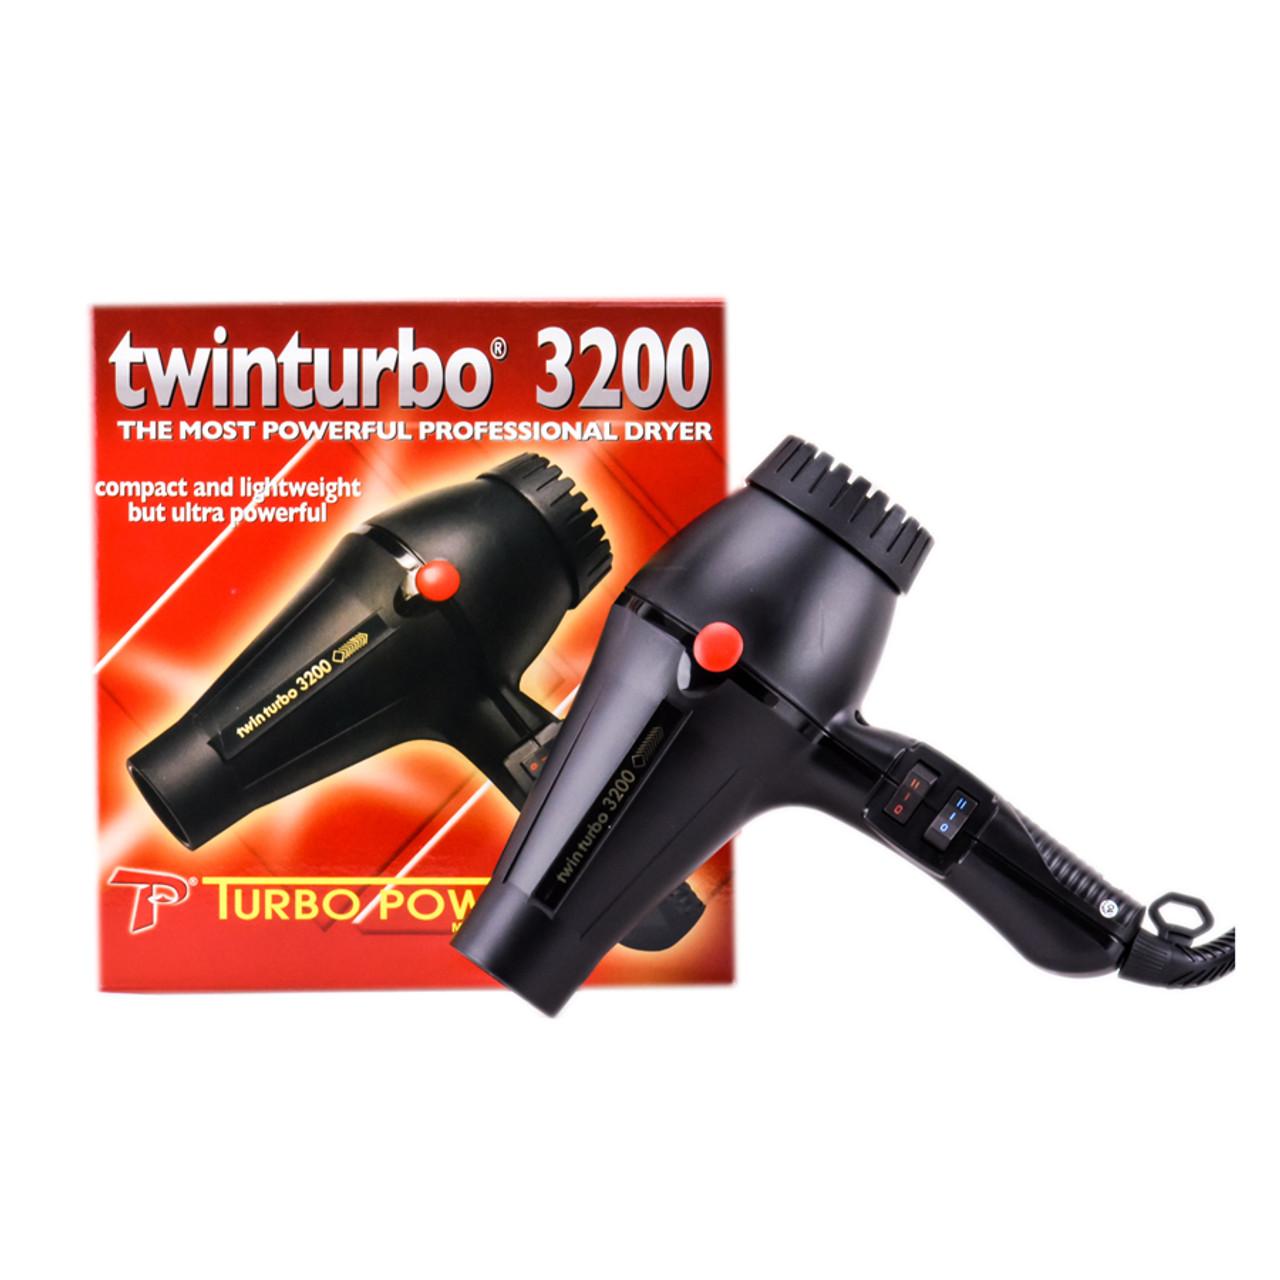 Turbo Power Twinturbo 3200 Compact Dryer Sleekshop